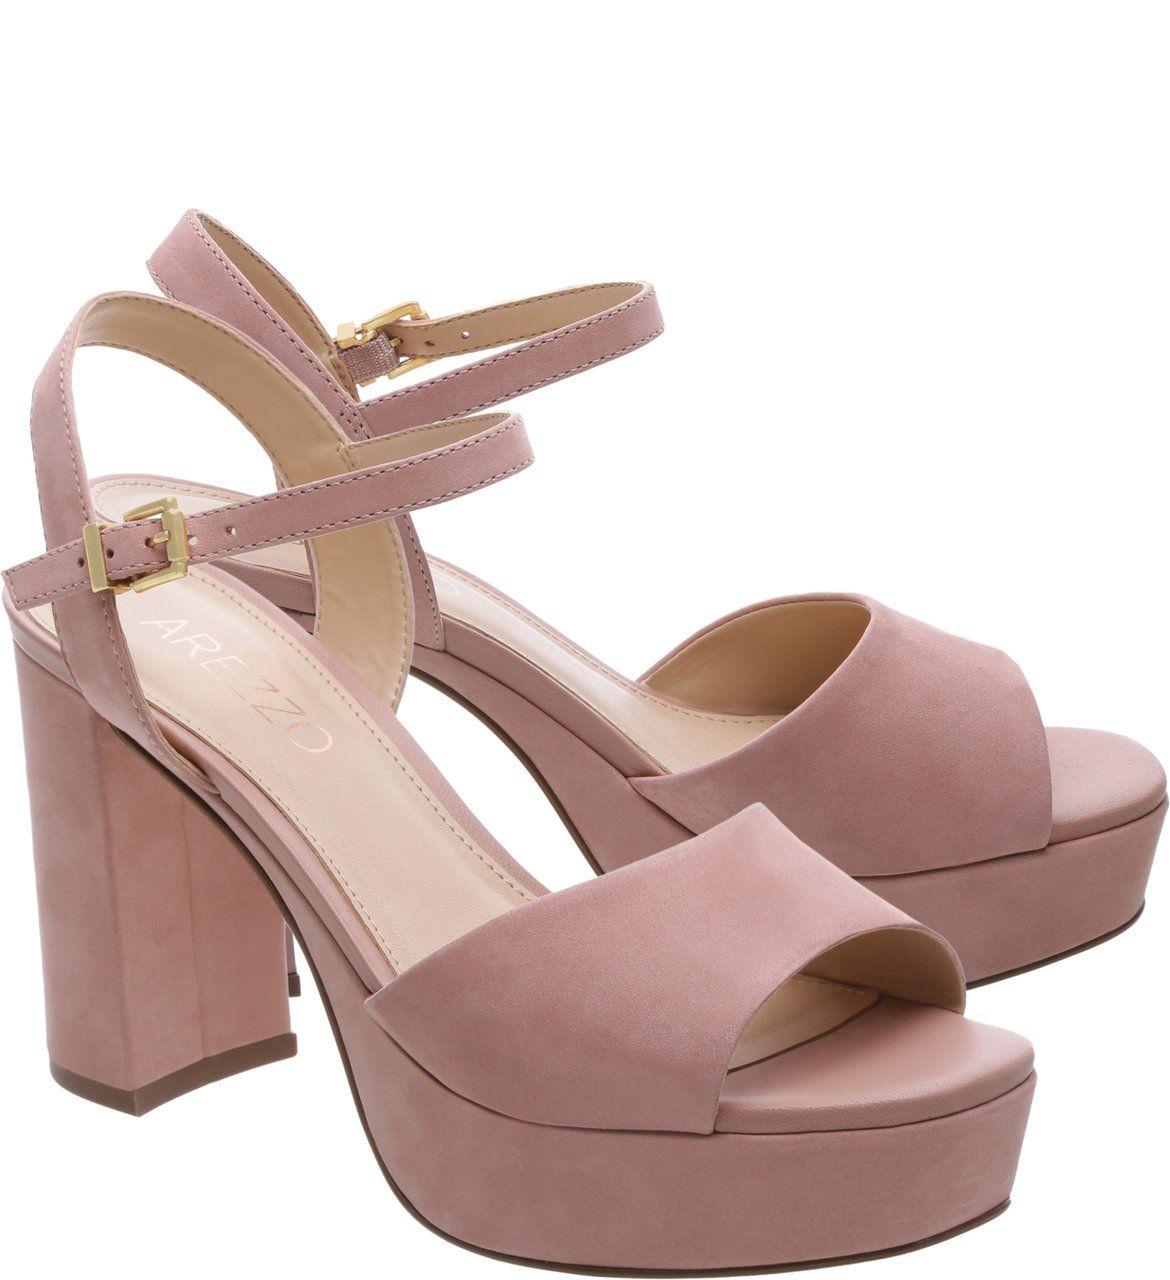 36d10a88cb Sandália Plataforma Nobuck Feminino Rose Blush